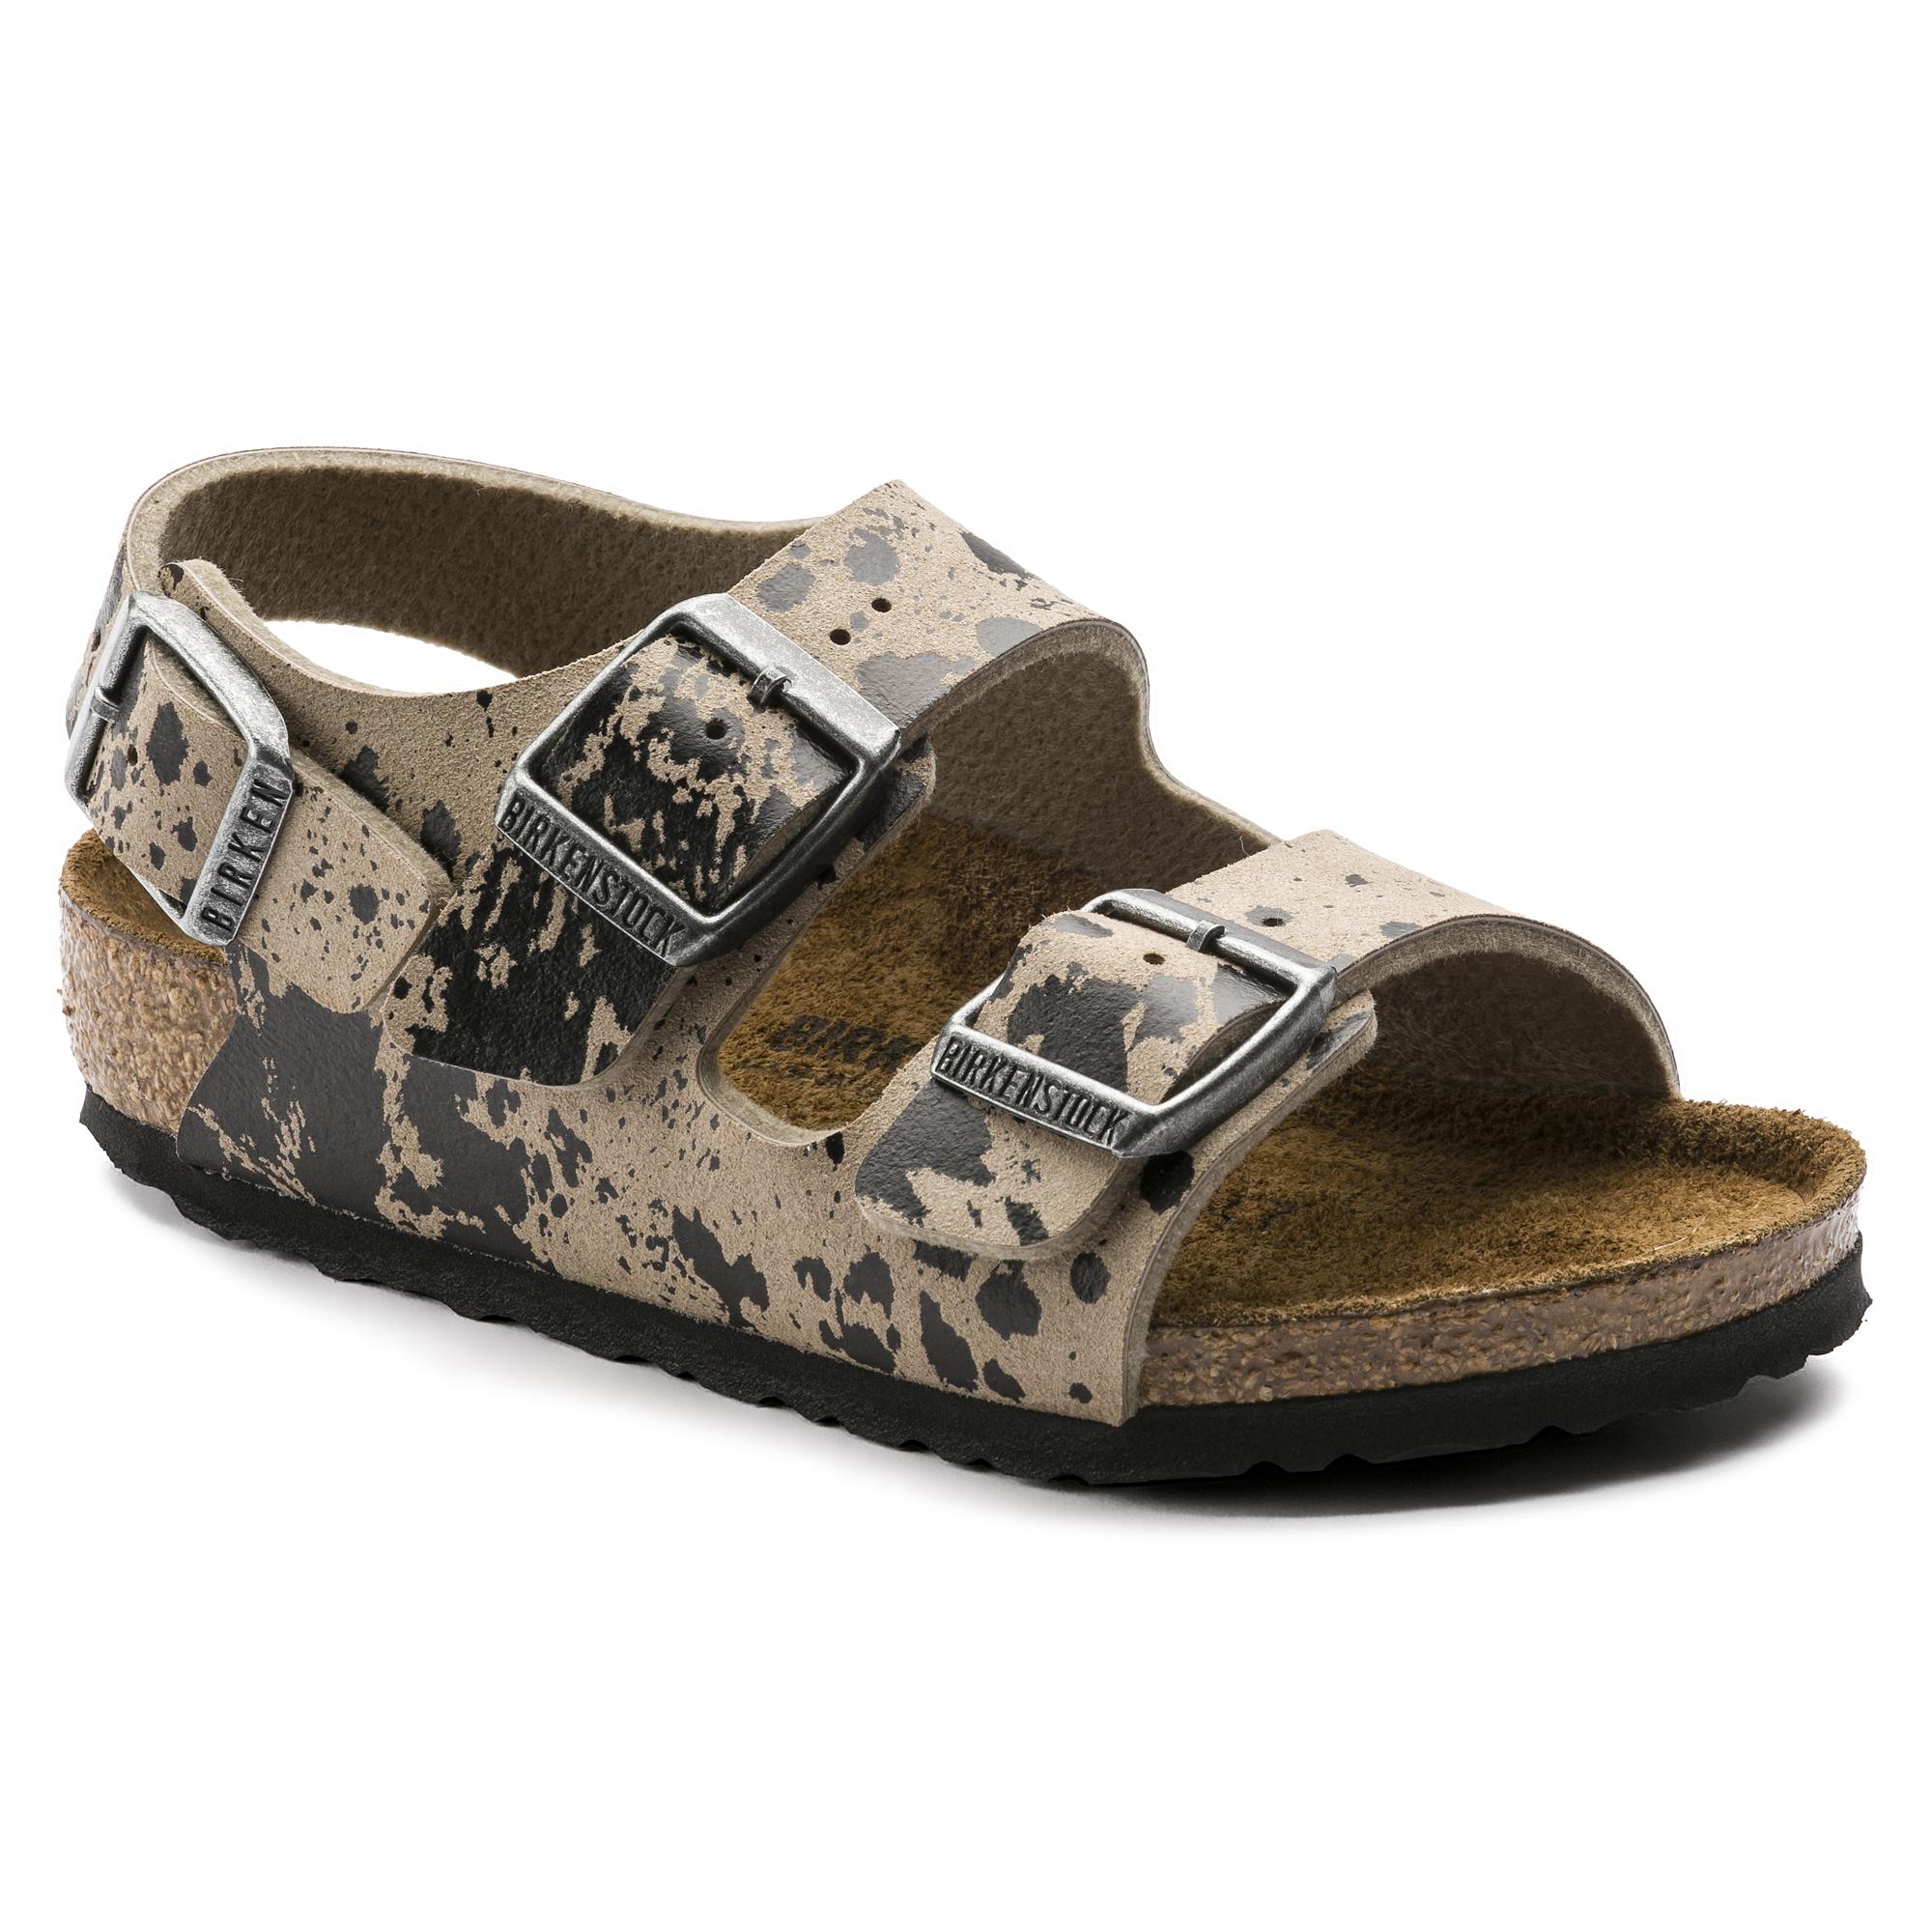 2cb997691228 Discount Birkenstock Molina Canada Athletic Sandal. birkenstocks discount  code